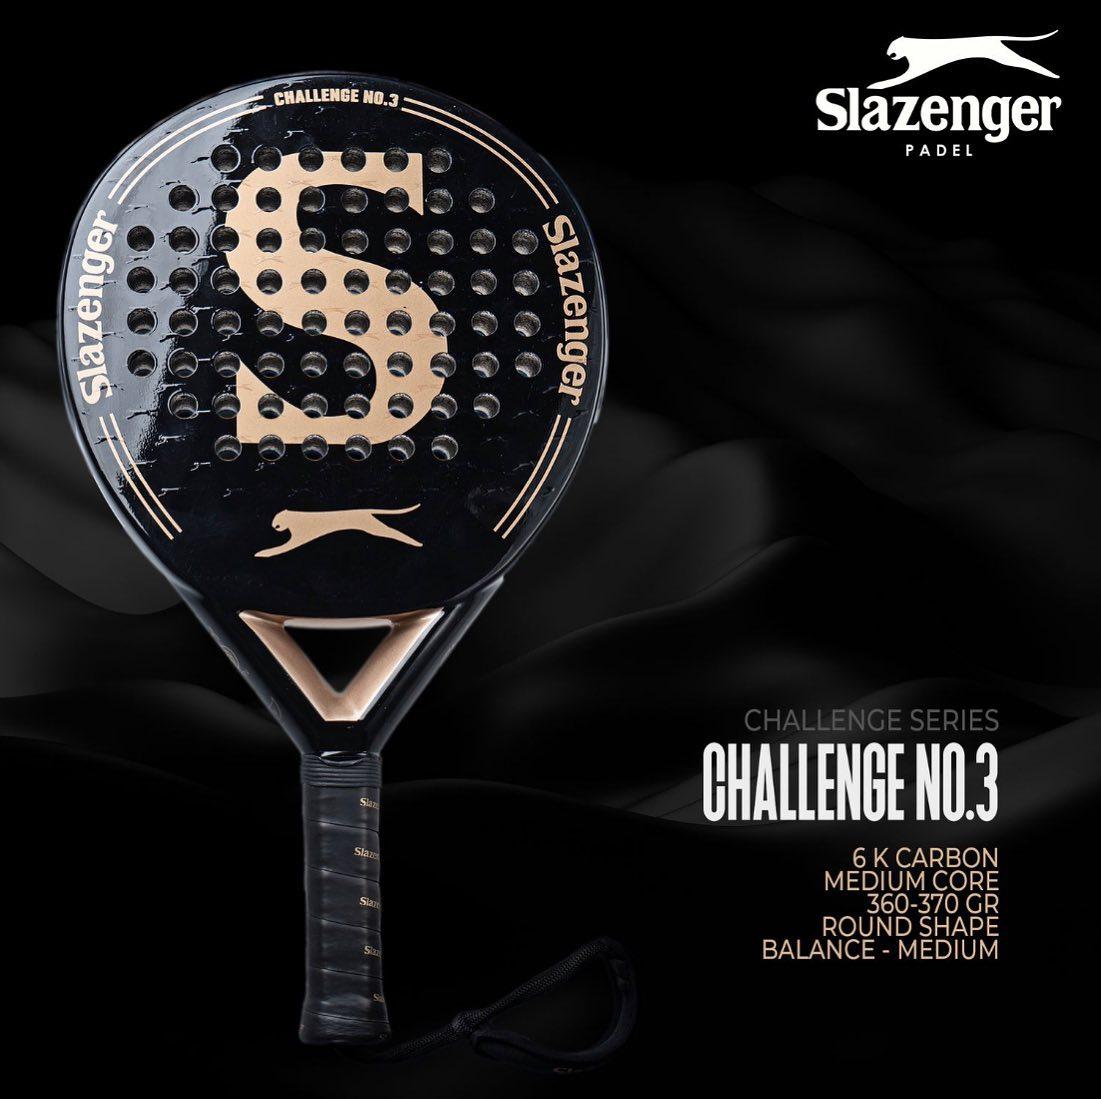 Slazenger padel 2021 Challenge No.3